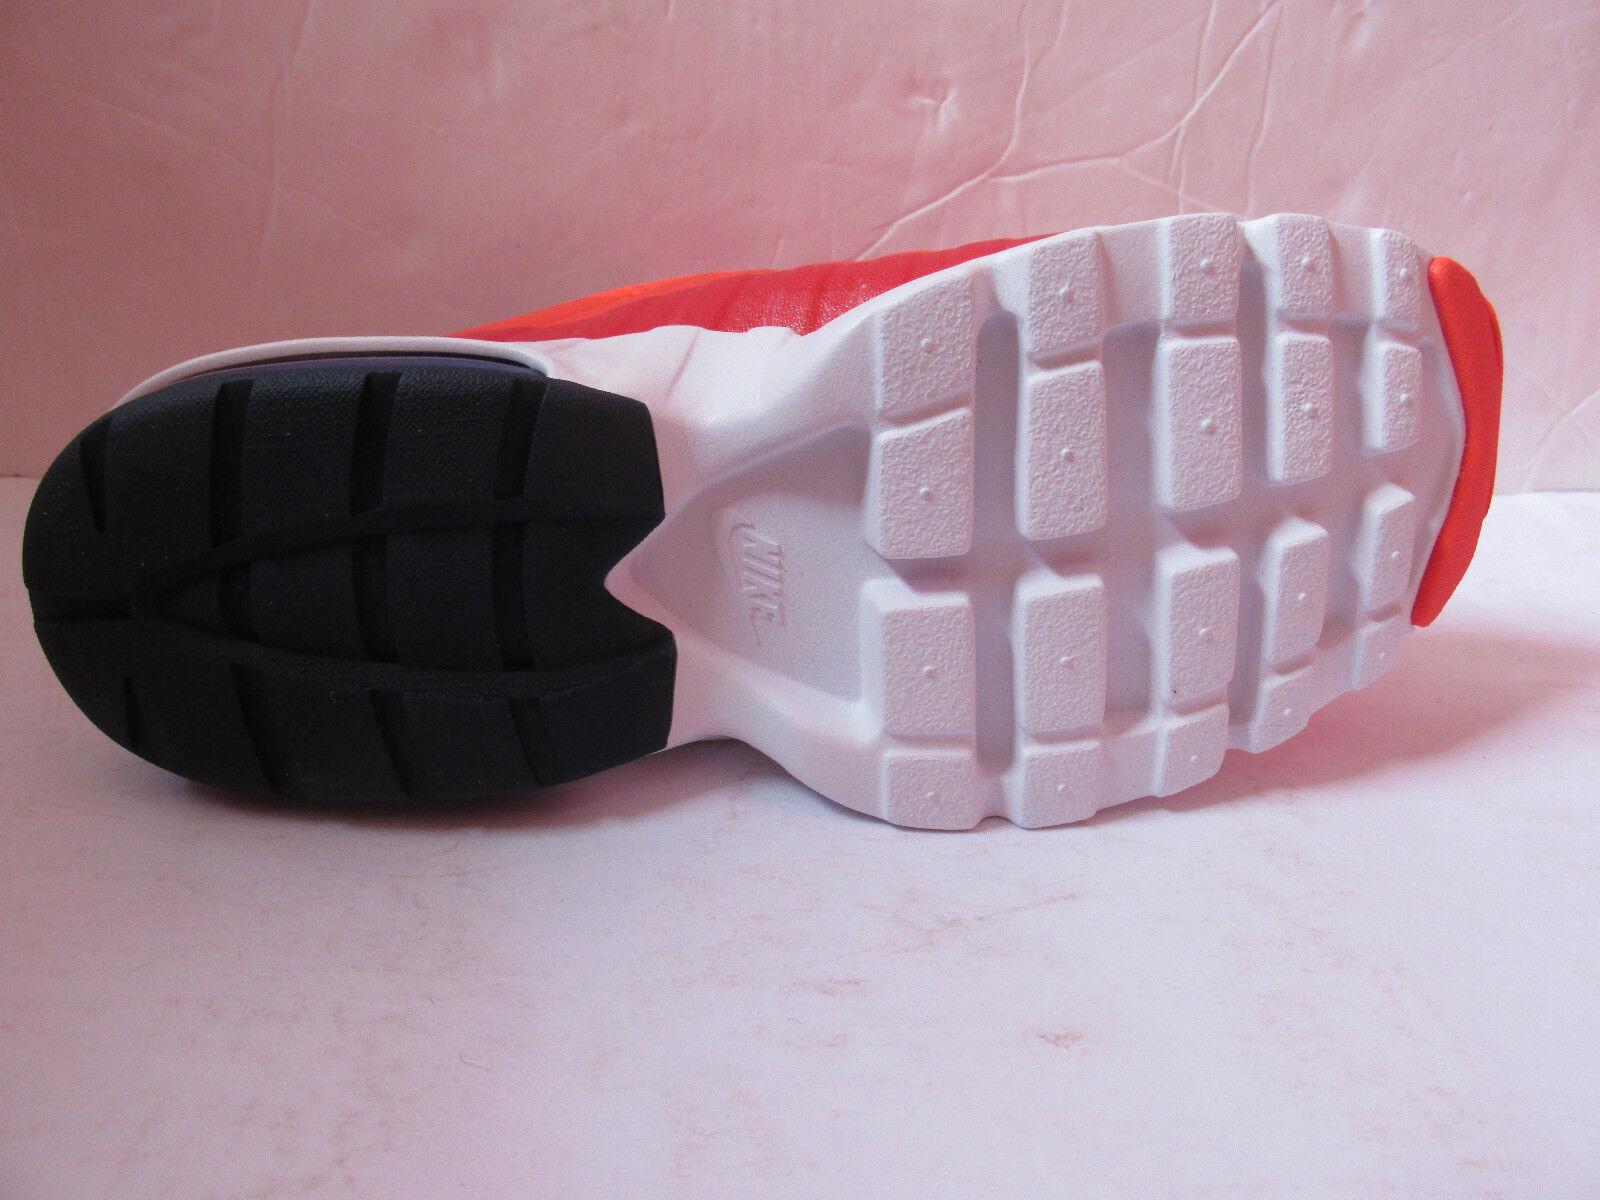 Nike Damen Air Max 95 Turnschuhe Ultra Laufschuhe 749212 600 Turnschuhe 95 29f3c9